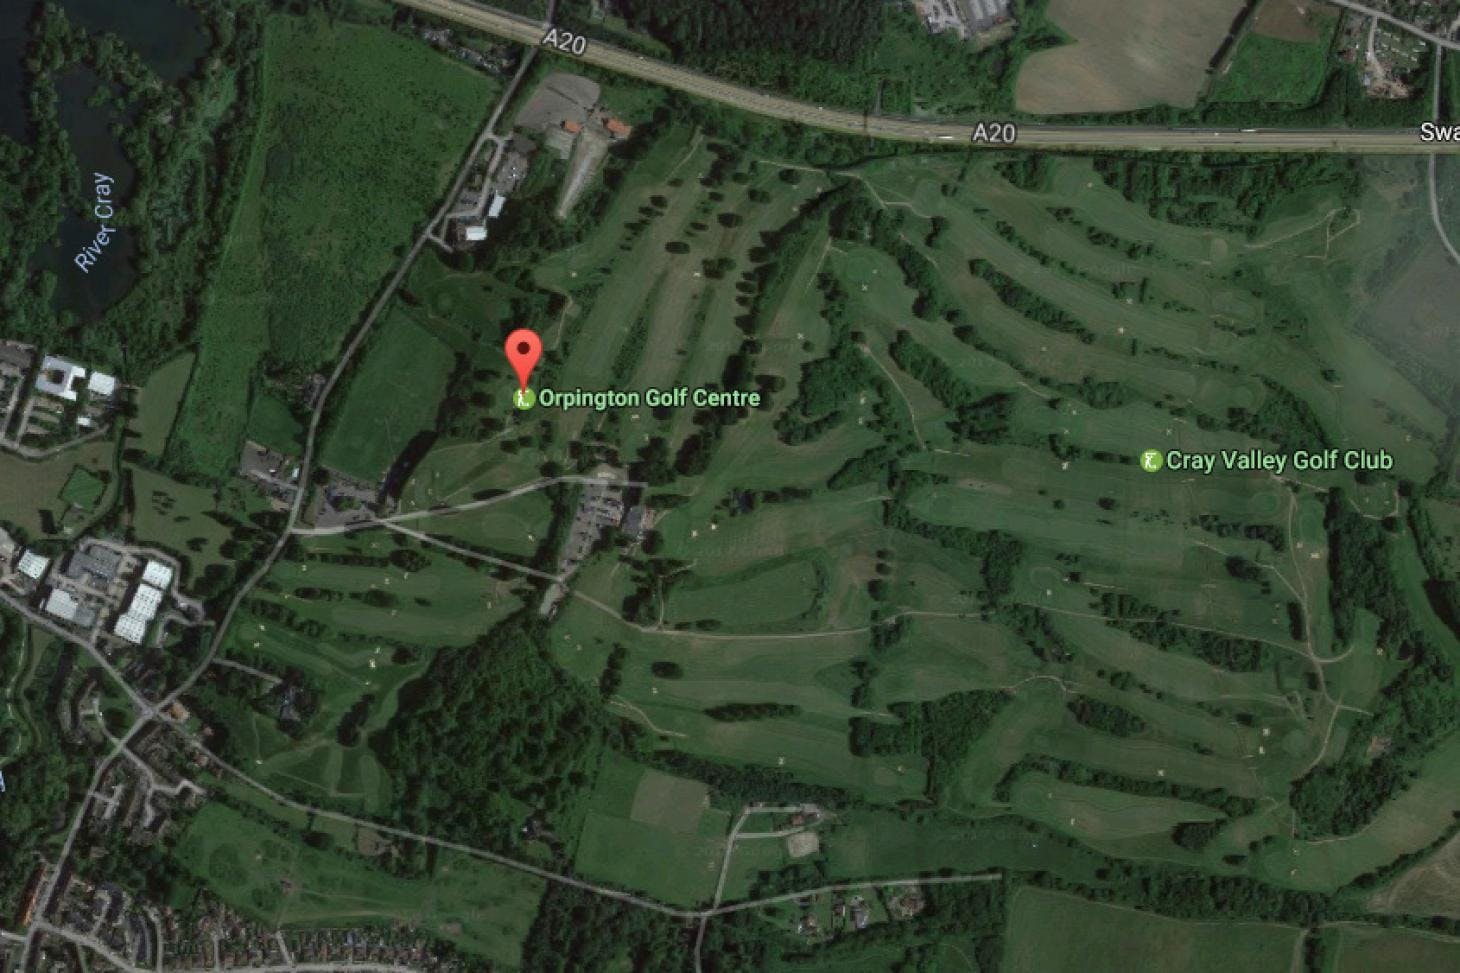 Orpington Golf Centre 18 hole golf course